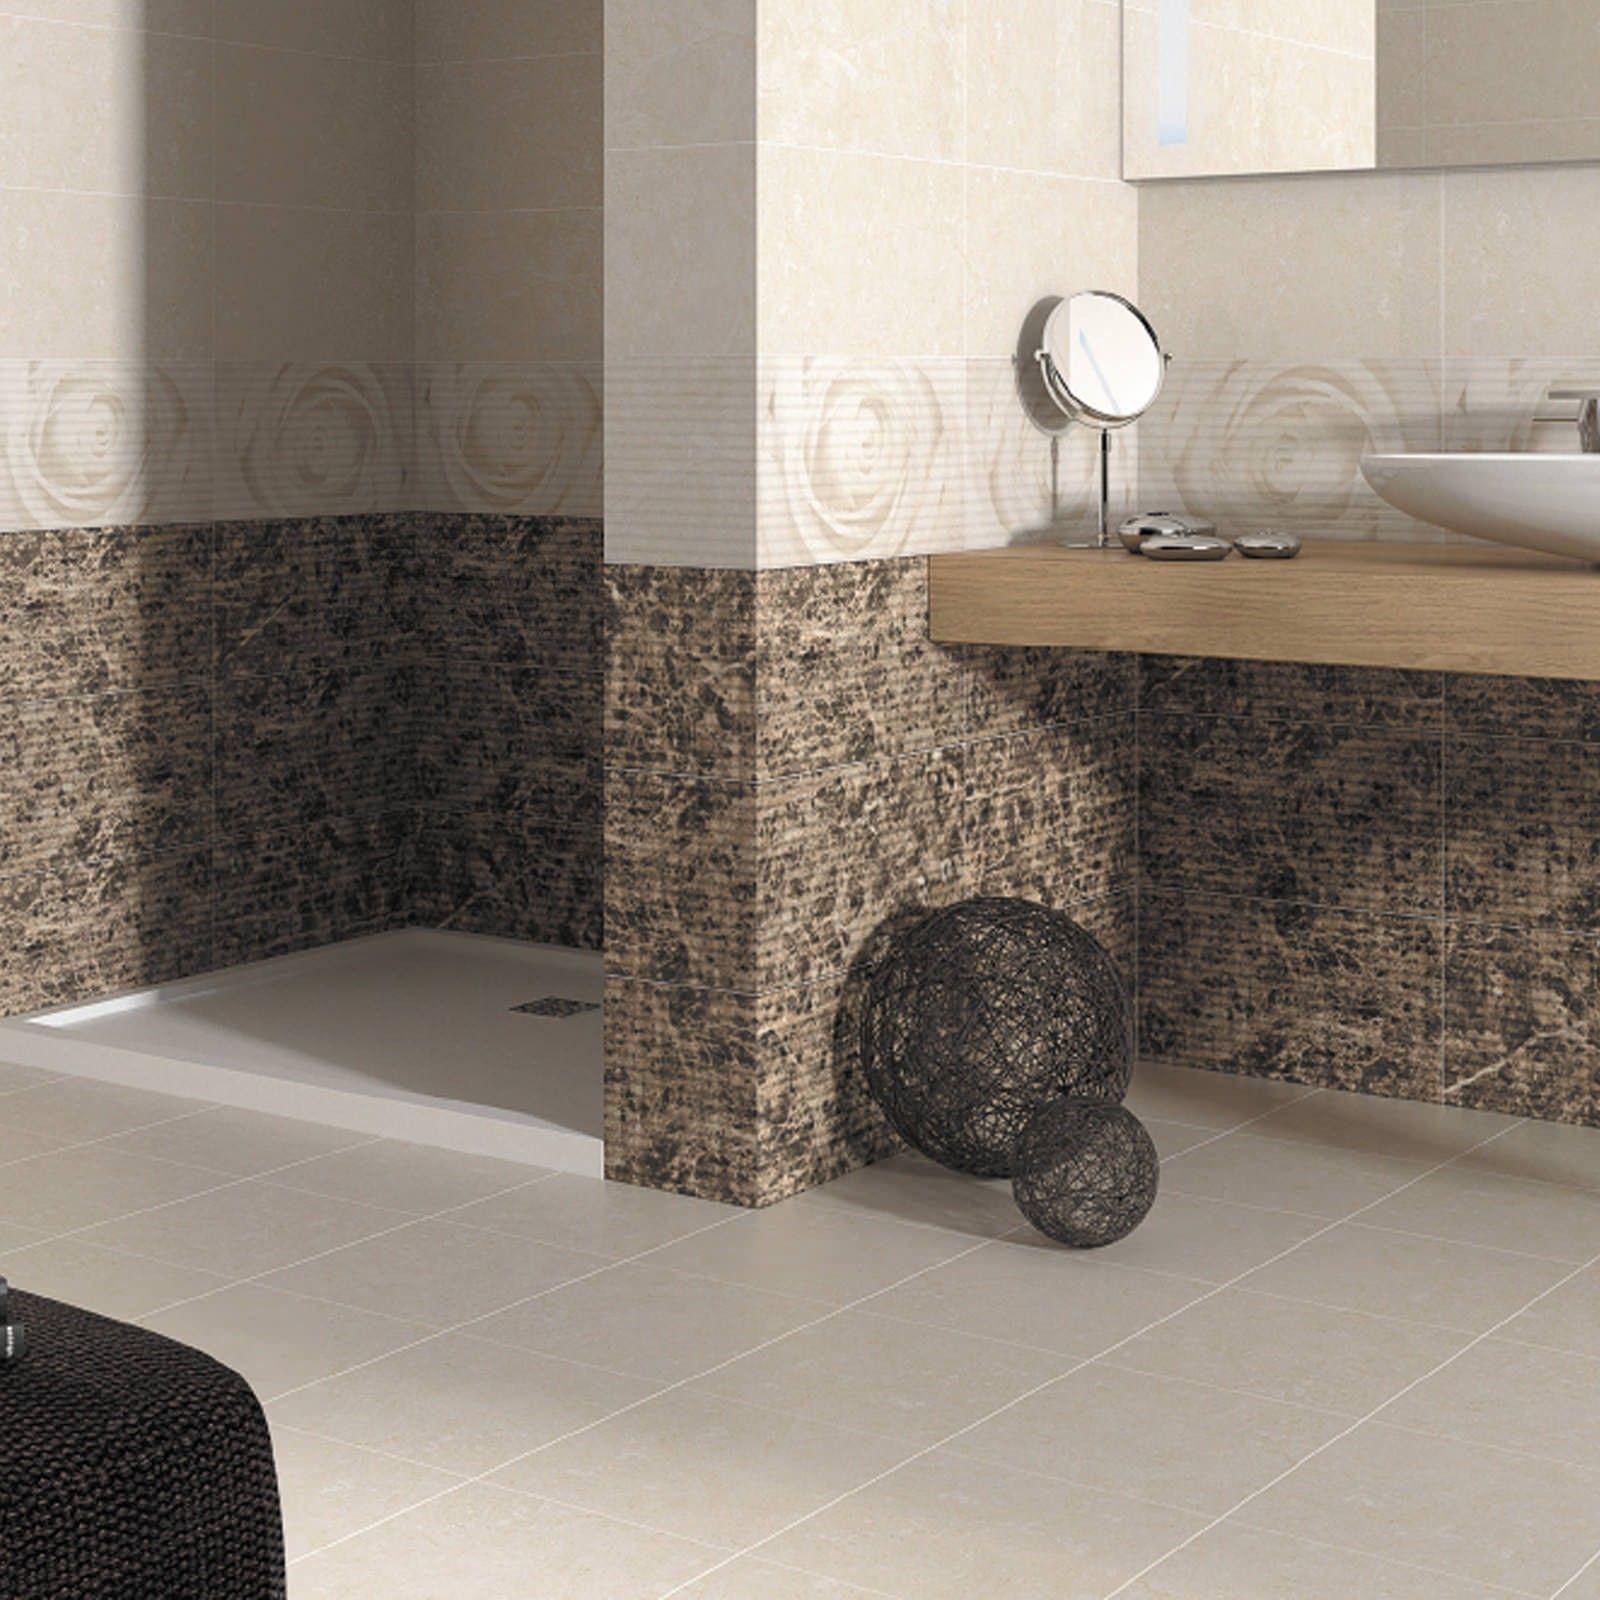 Crema Marfil Floor Tile Amazing Bathrooms Tile Floor Tiles